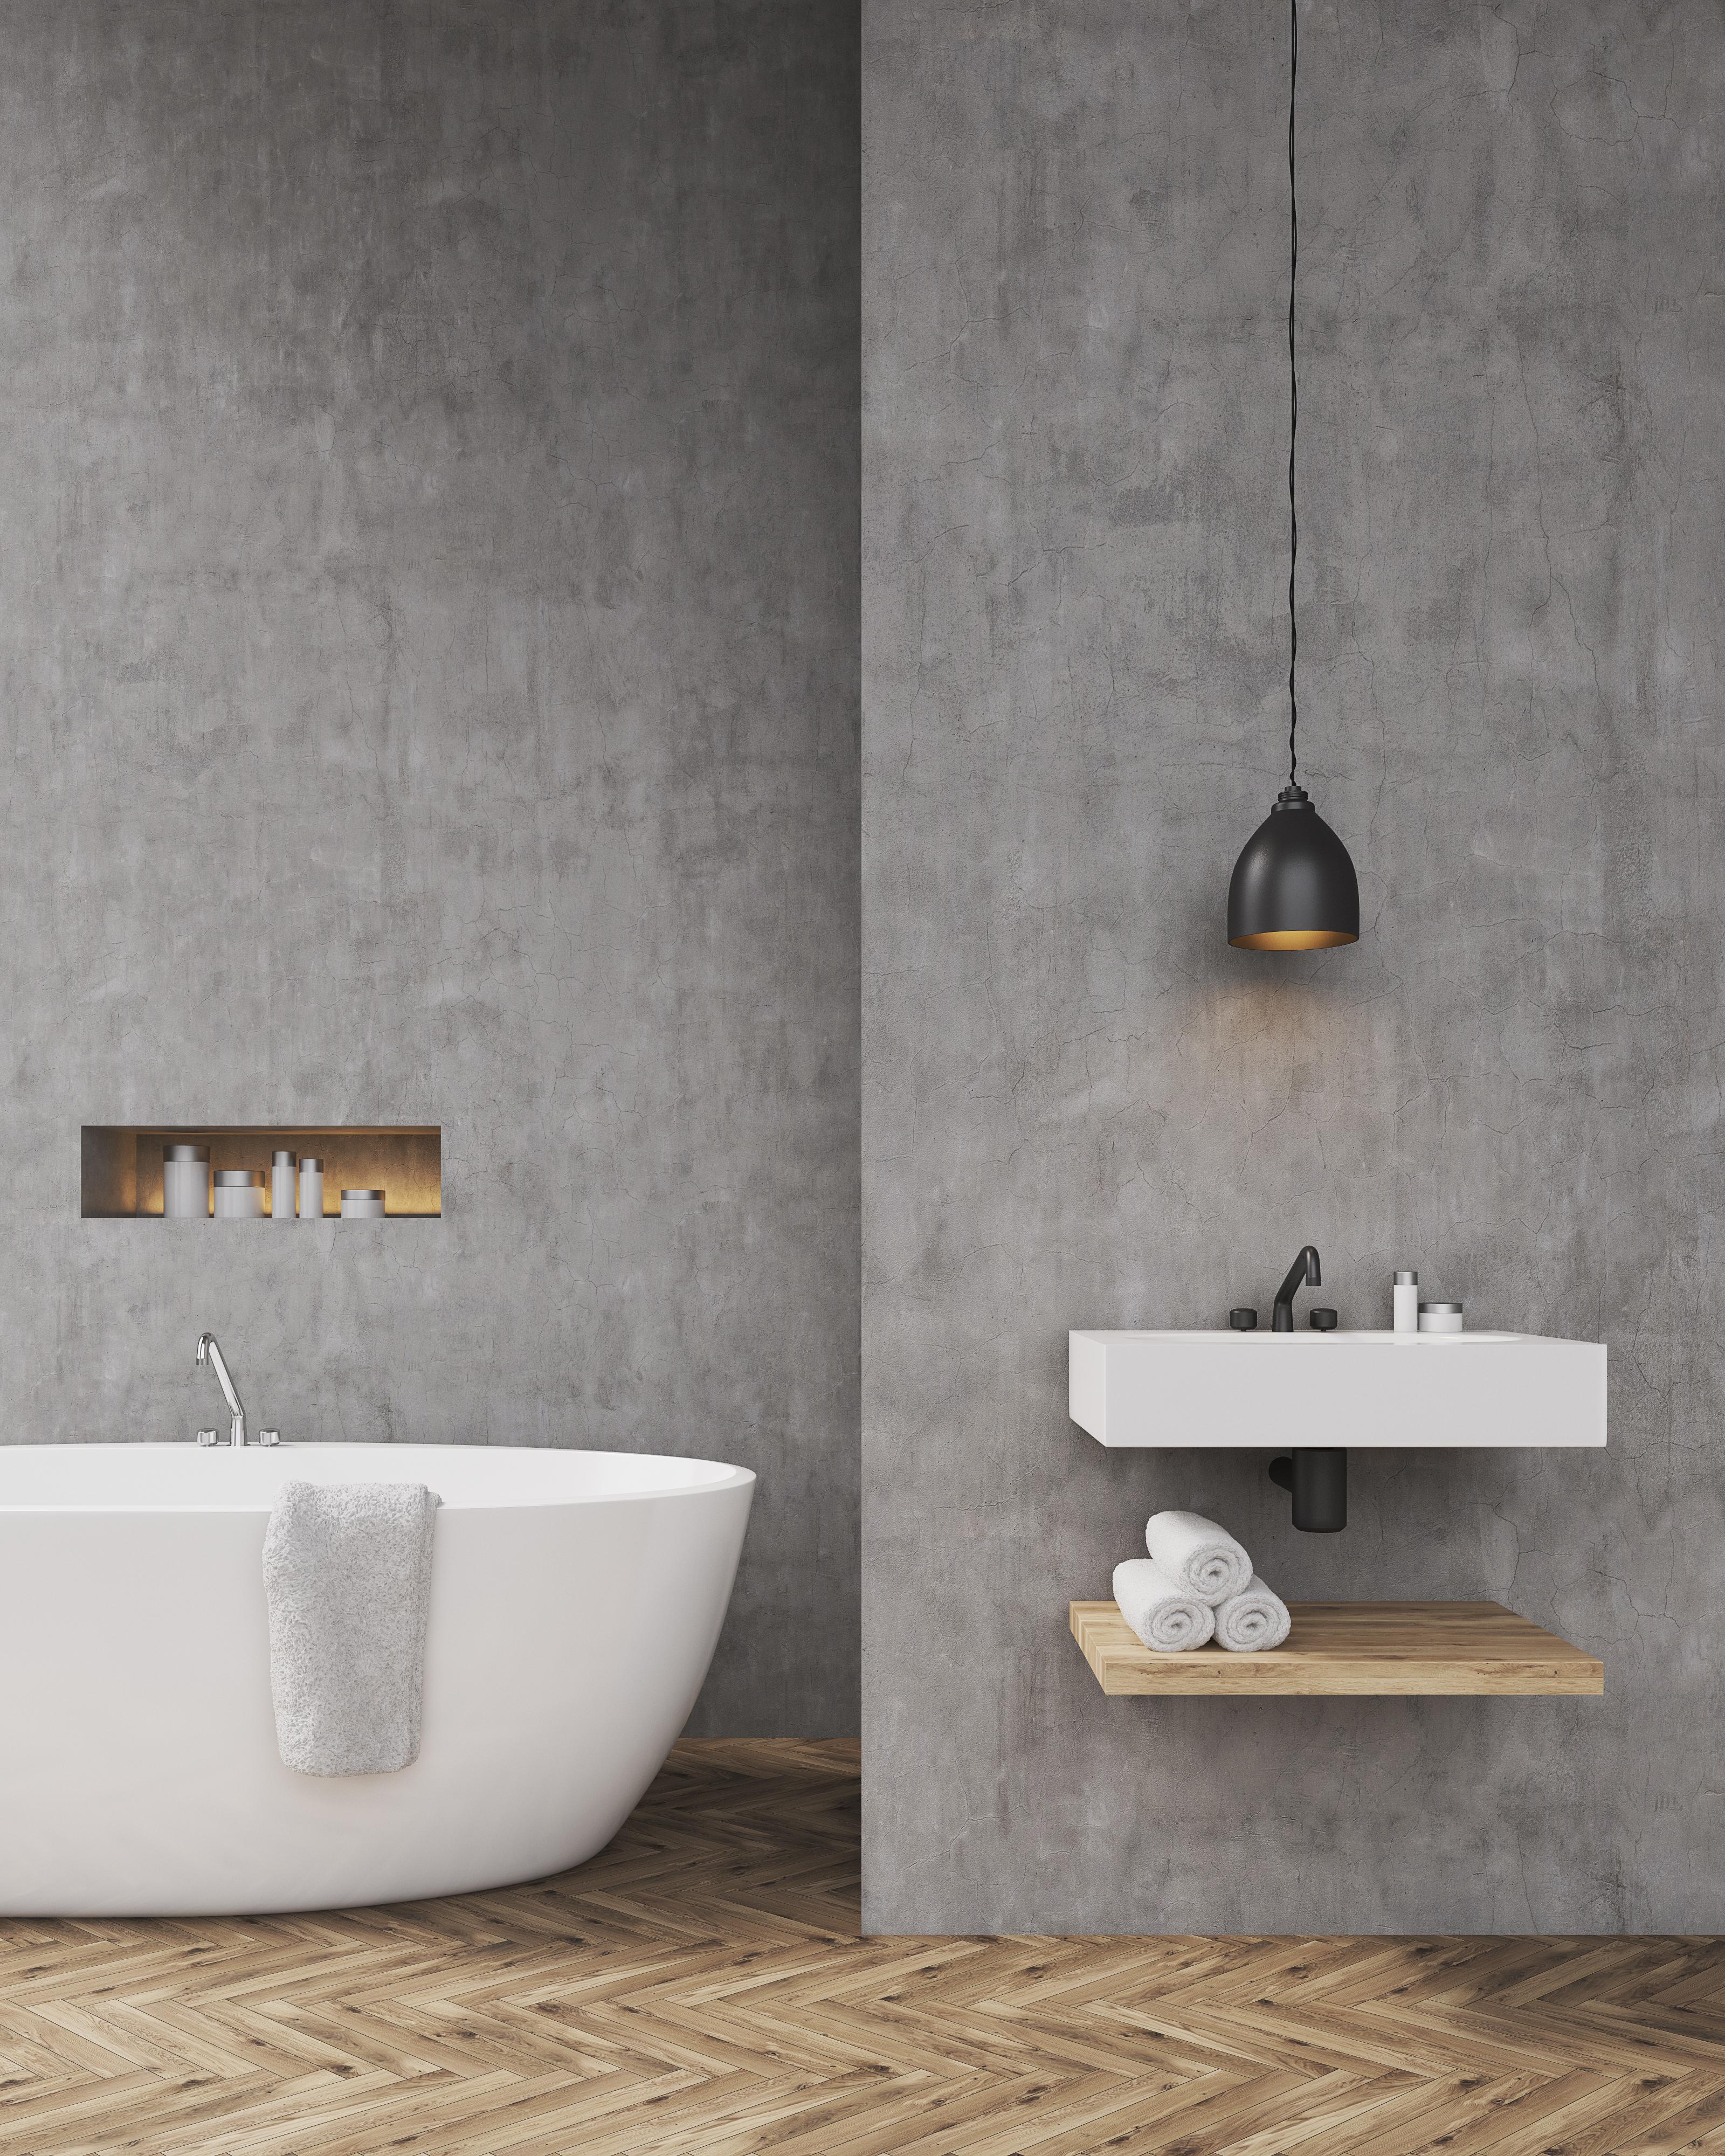 béton ciré salle de bain sur mur